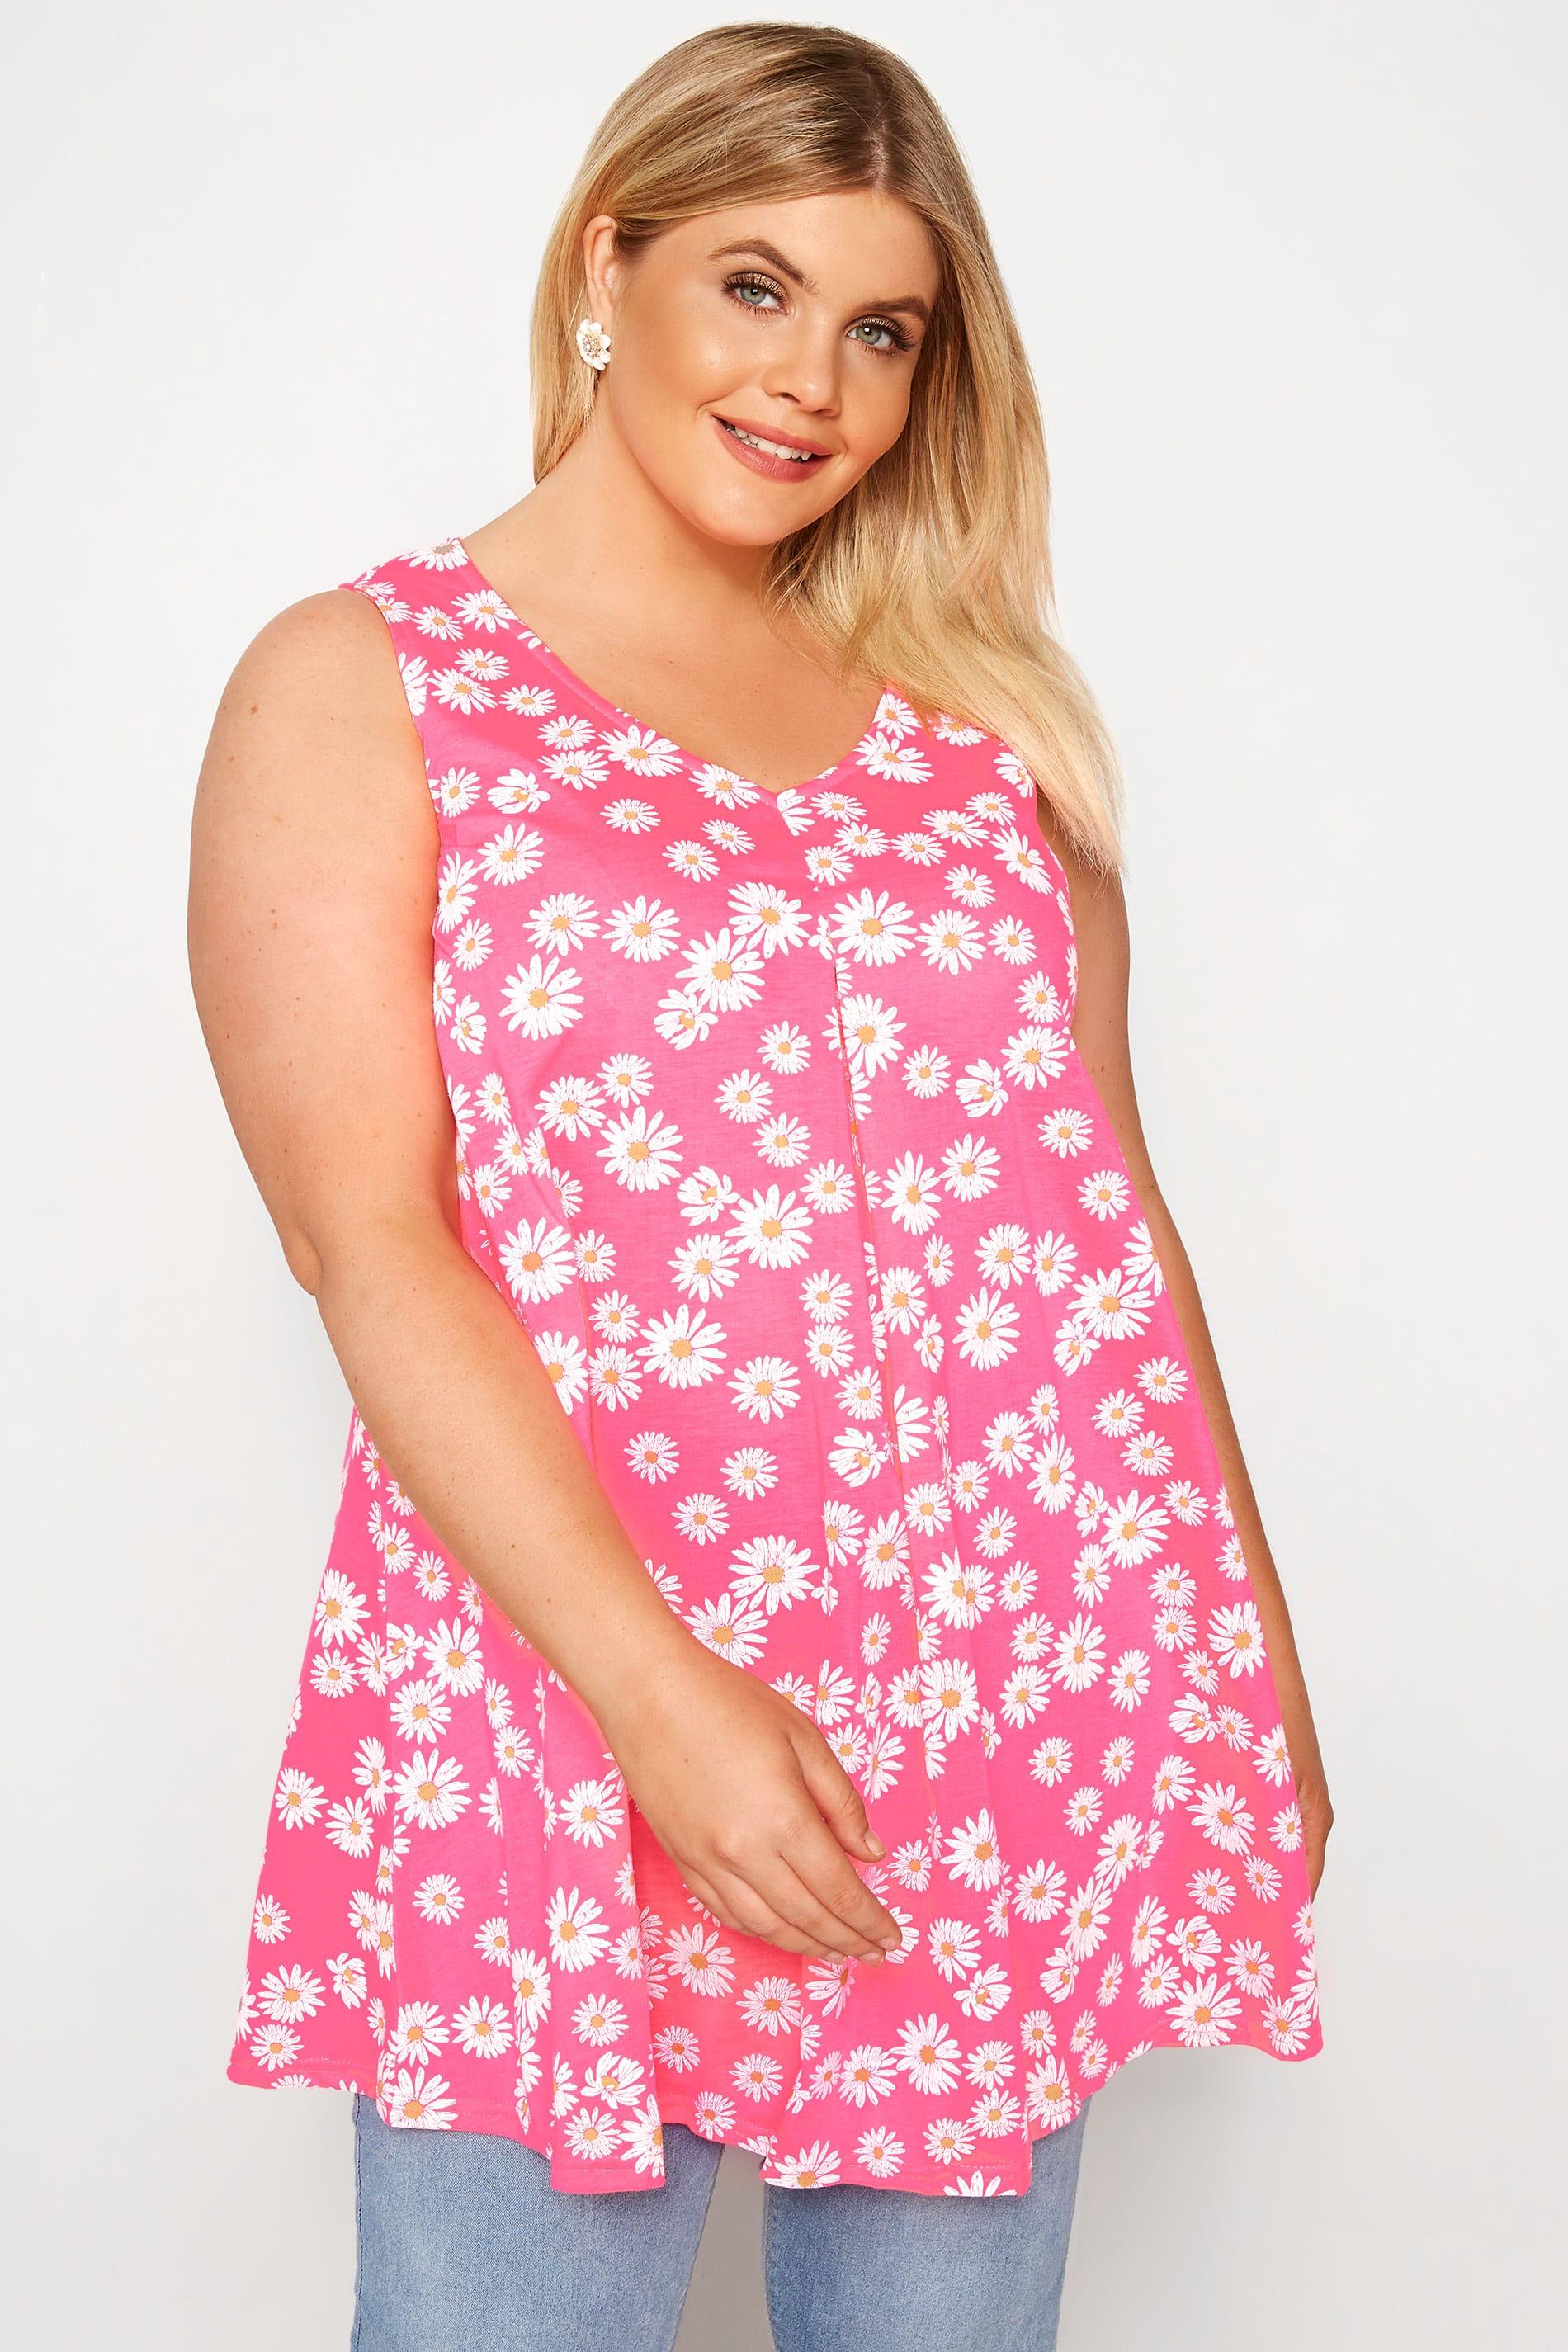 Neon Pink Daisy Print Swing Top